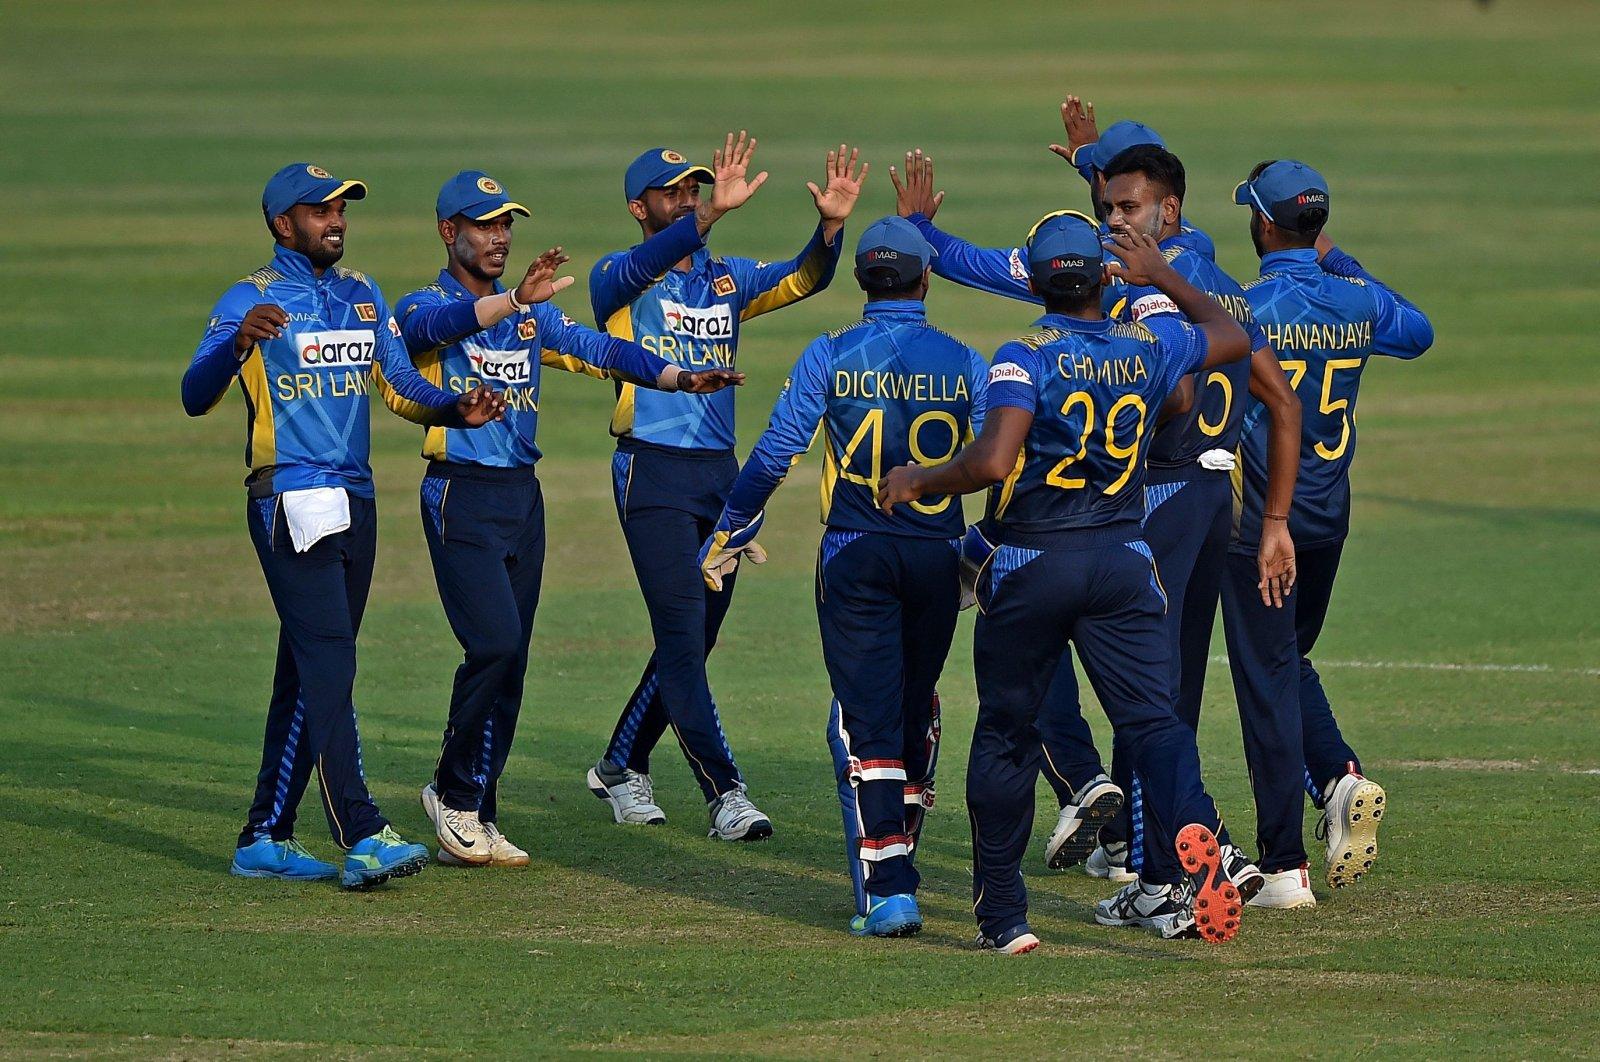 Sri Lankan cricketers celebrate the dismissal of Bangladesh's Naim Sheikh (not pictured) during the third and final One Day International (ODI) match at Sher-e-Bangla National Cricket Stadium, Dhaka, Bangladesh, May 28, 2021. (AFP Photo)